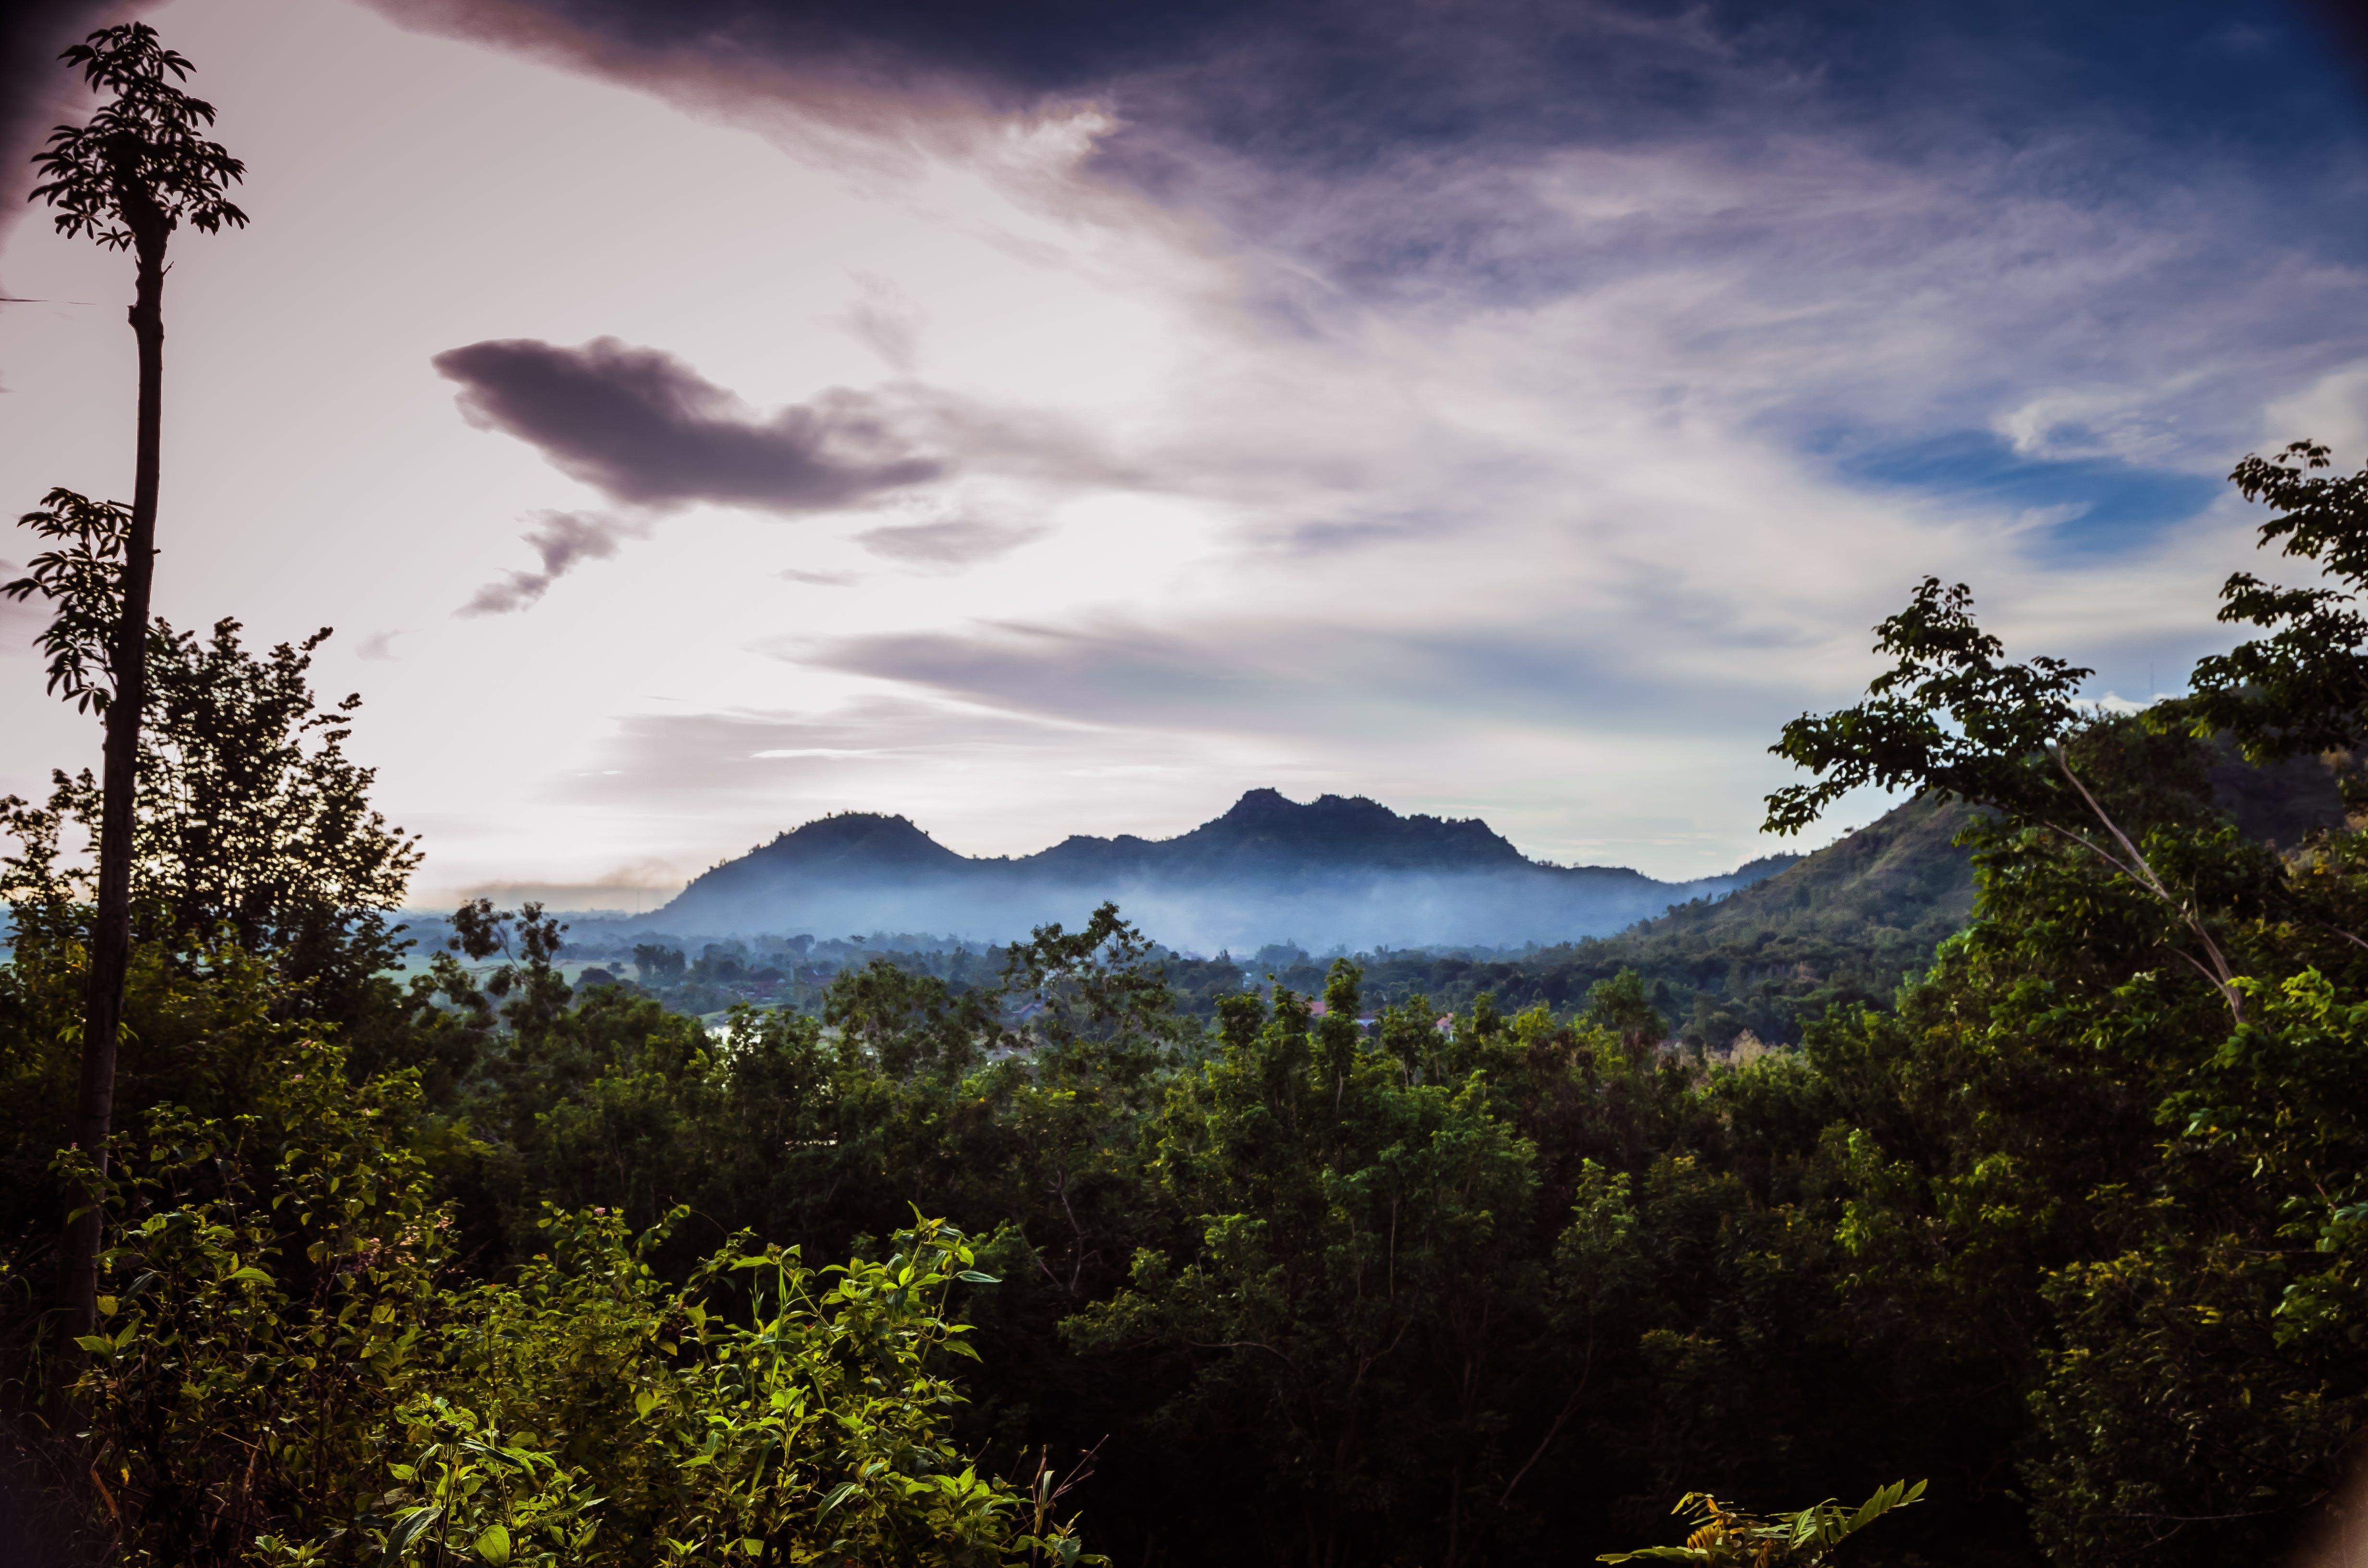 Základová fotografie zdarma na téma 4k tapeta, dešťový prales, HD tapeta, hory